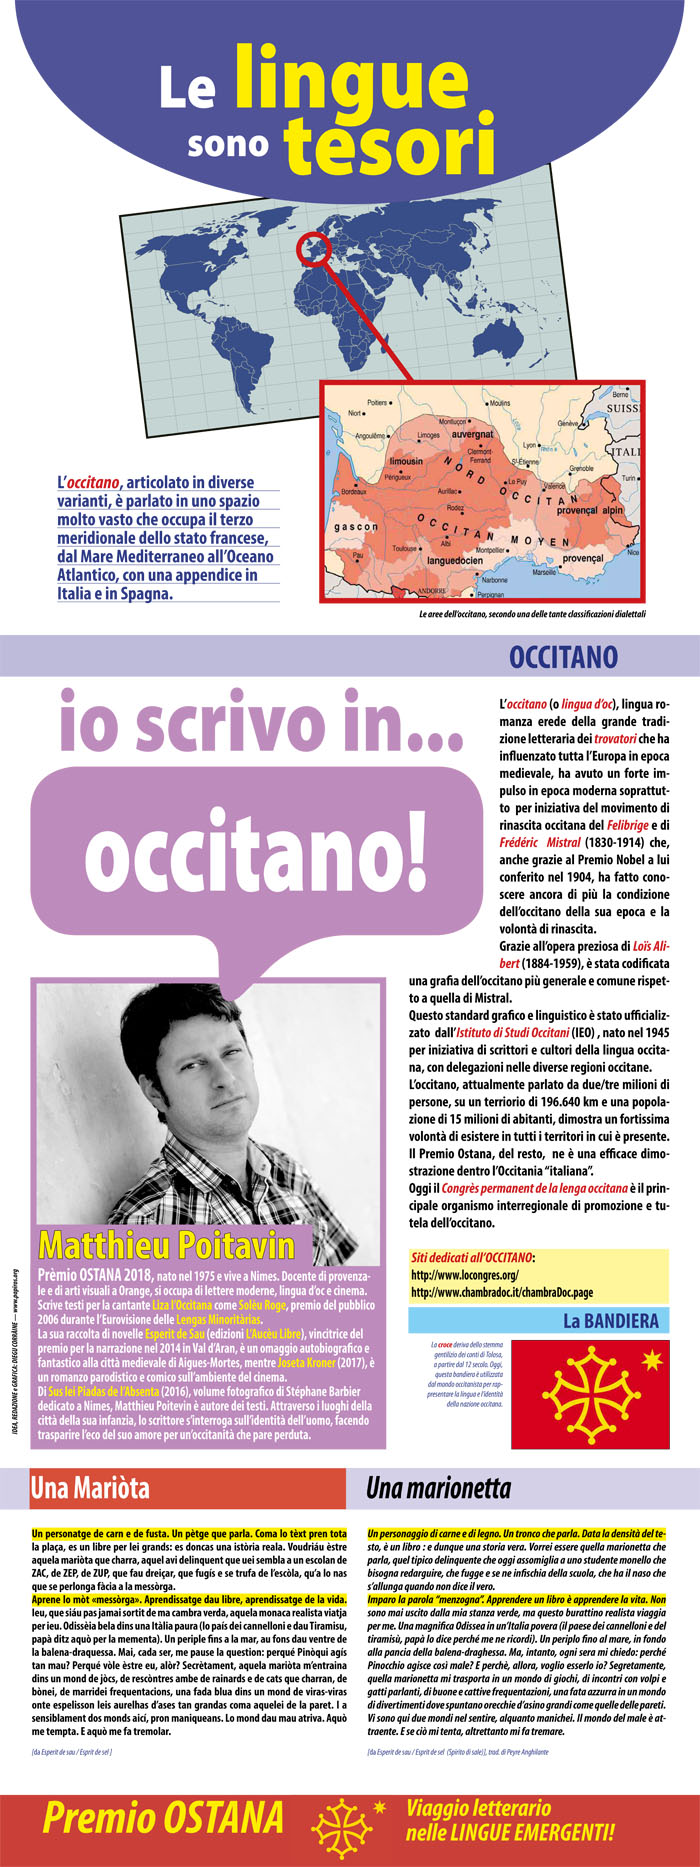 occitano.jpg